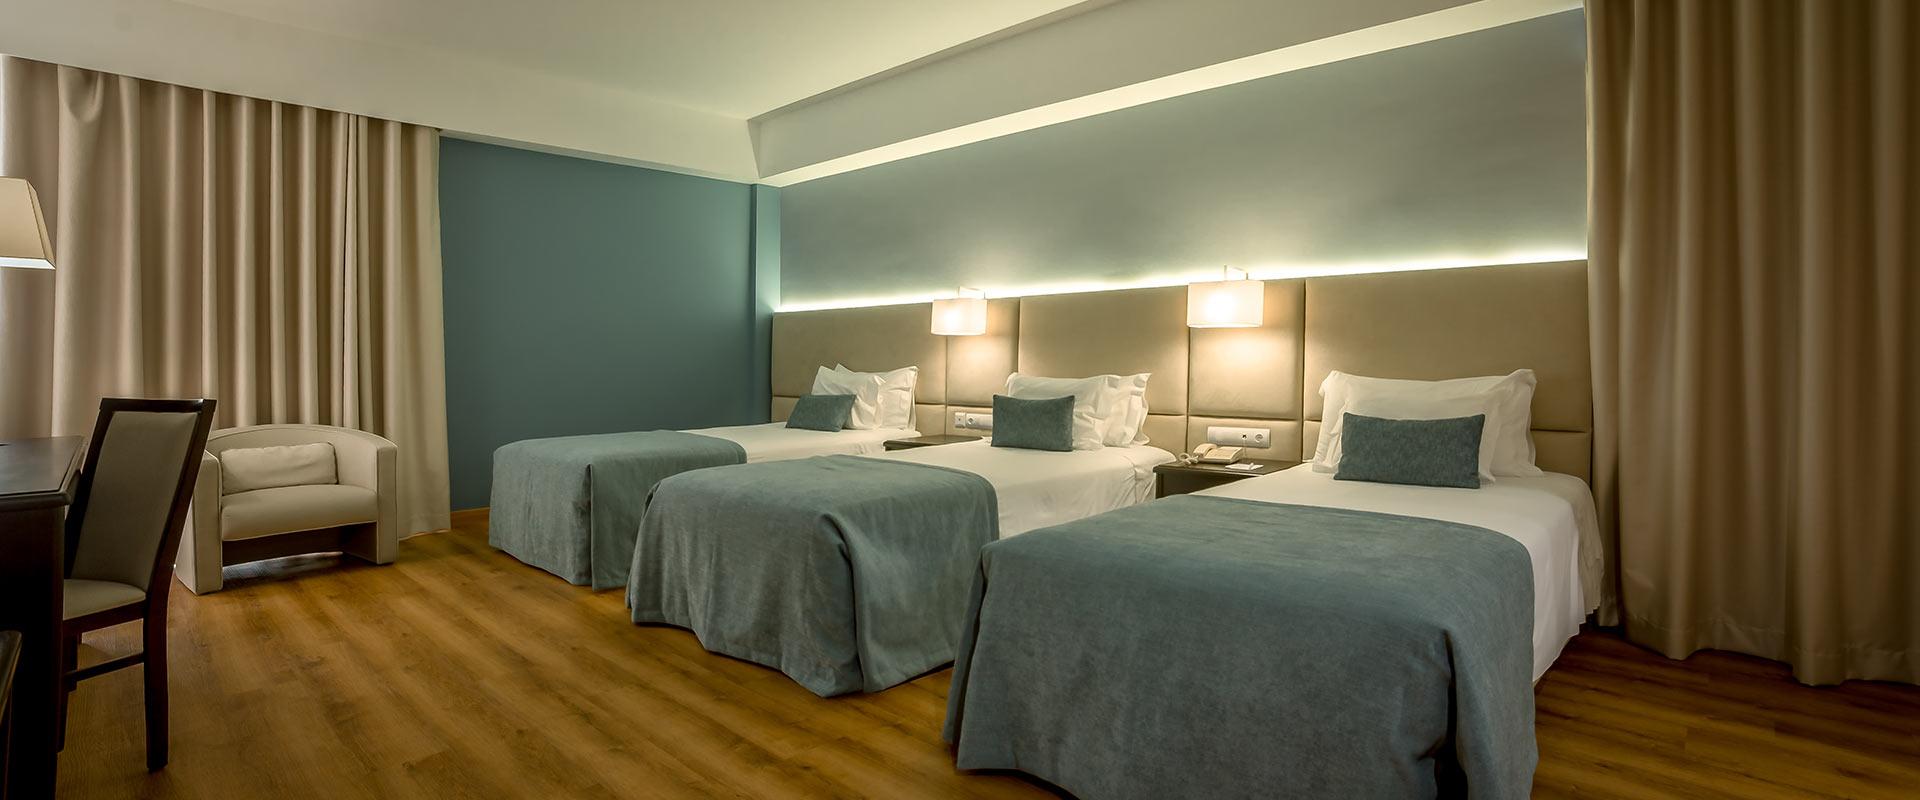 Dona-Maria-RMPZ-Hotel-M-QTriplo.jpg